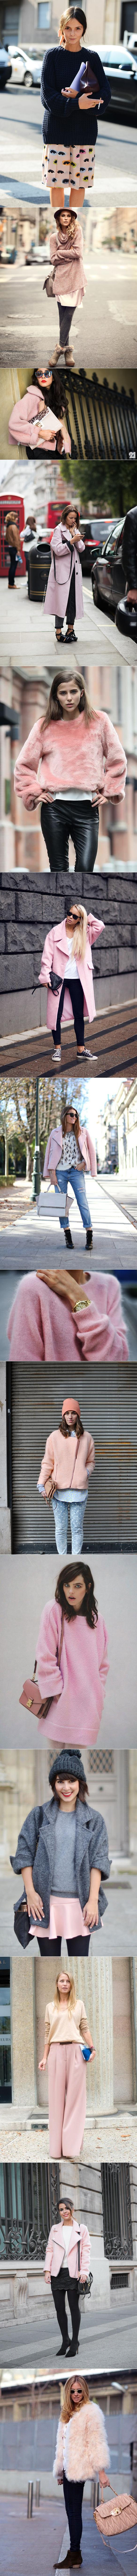 15colgadasdeunapercha_15LWL_pink_in_winter_2